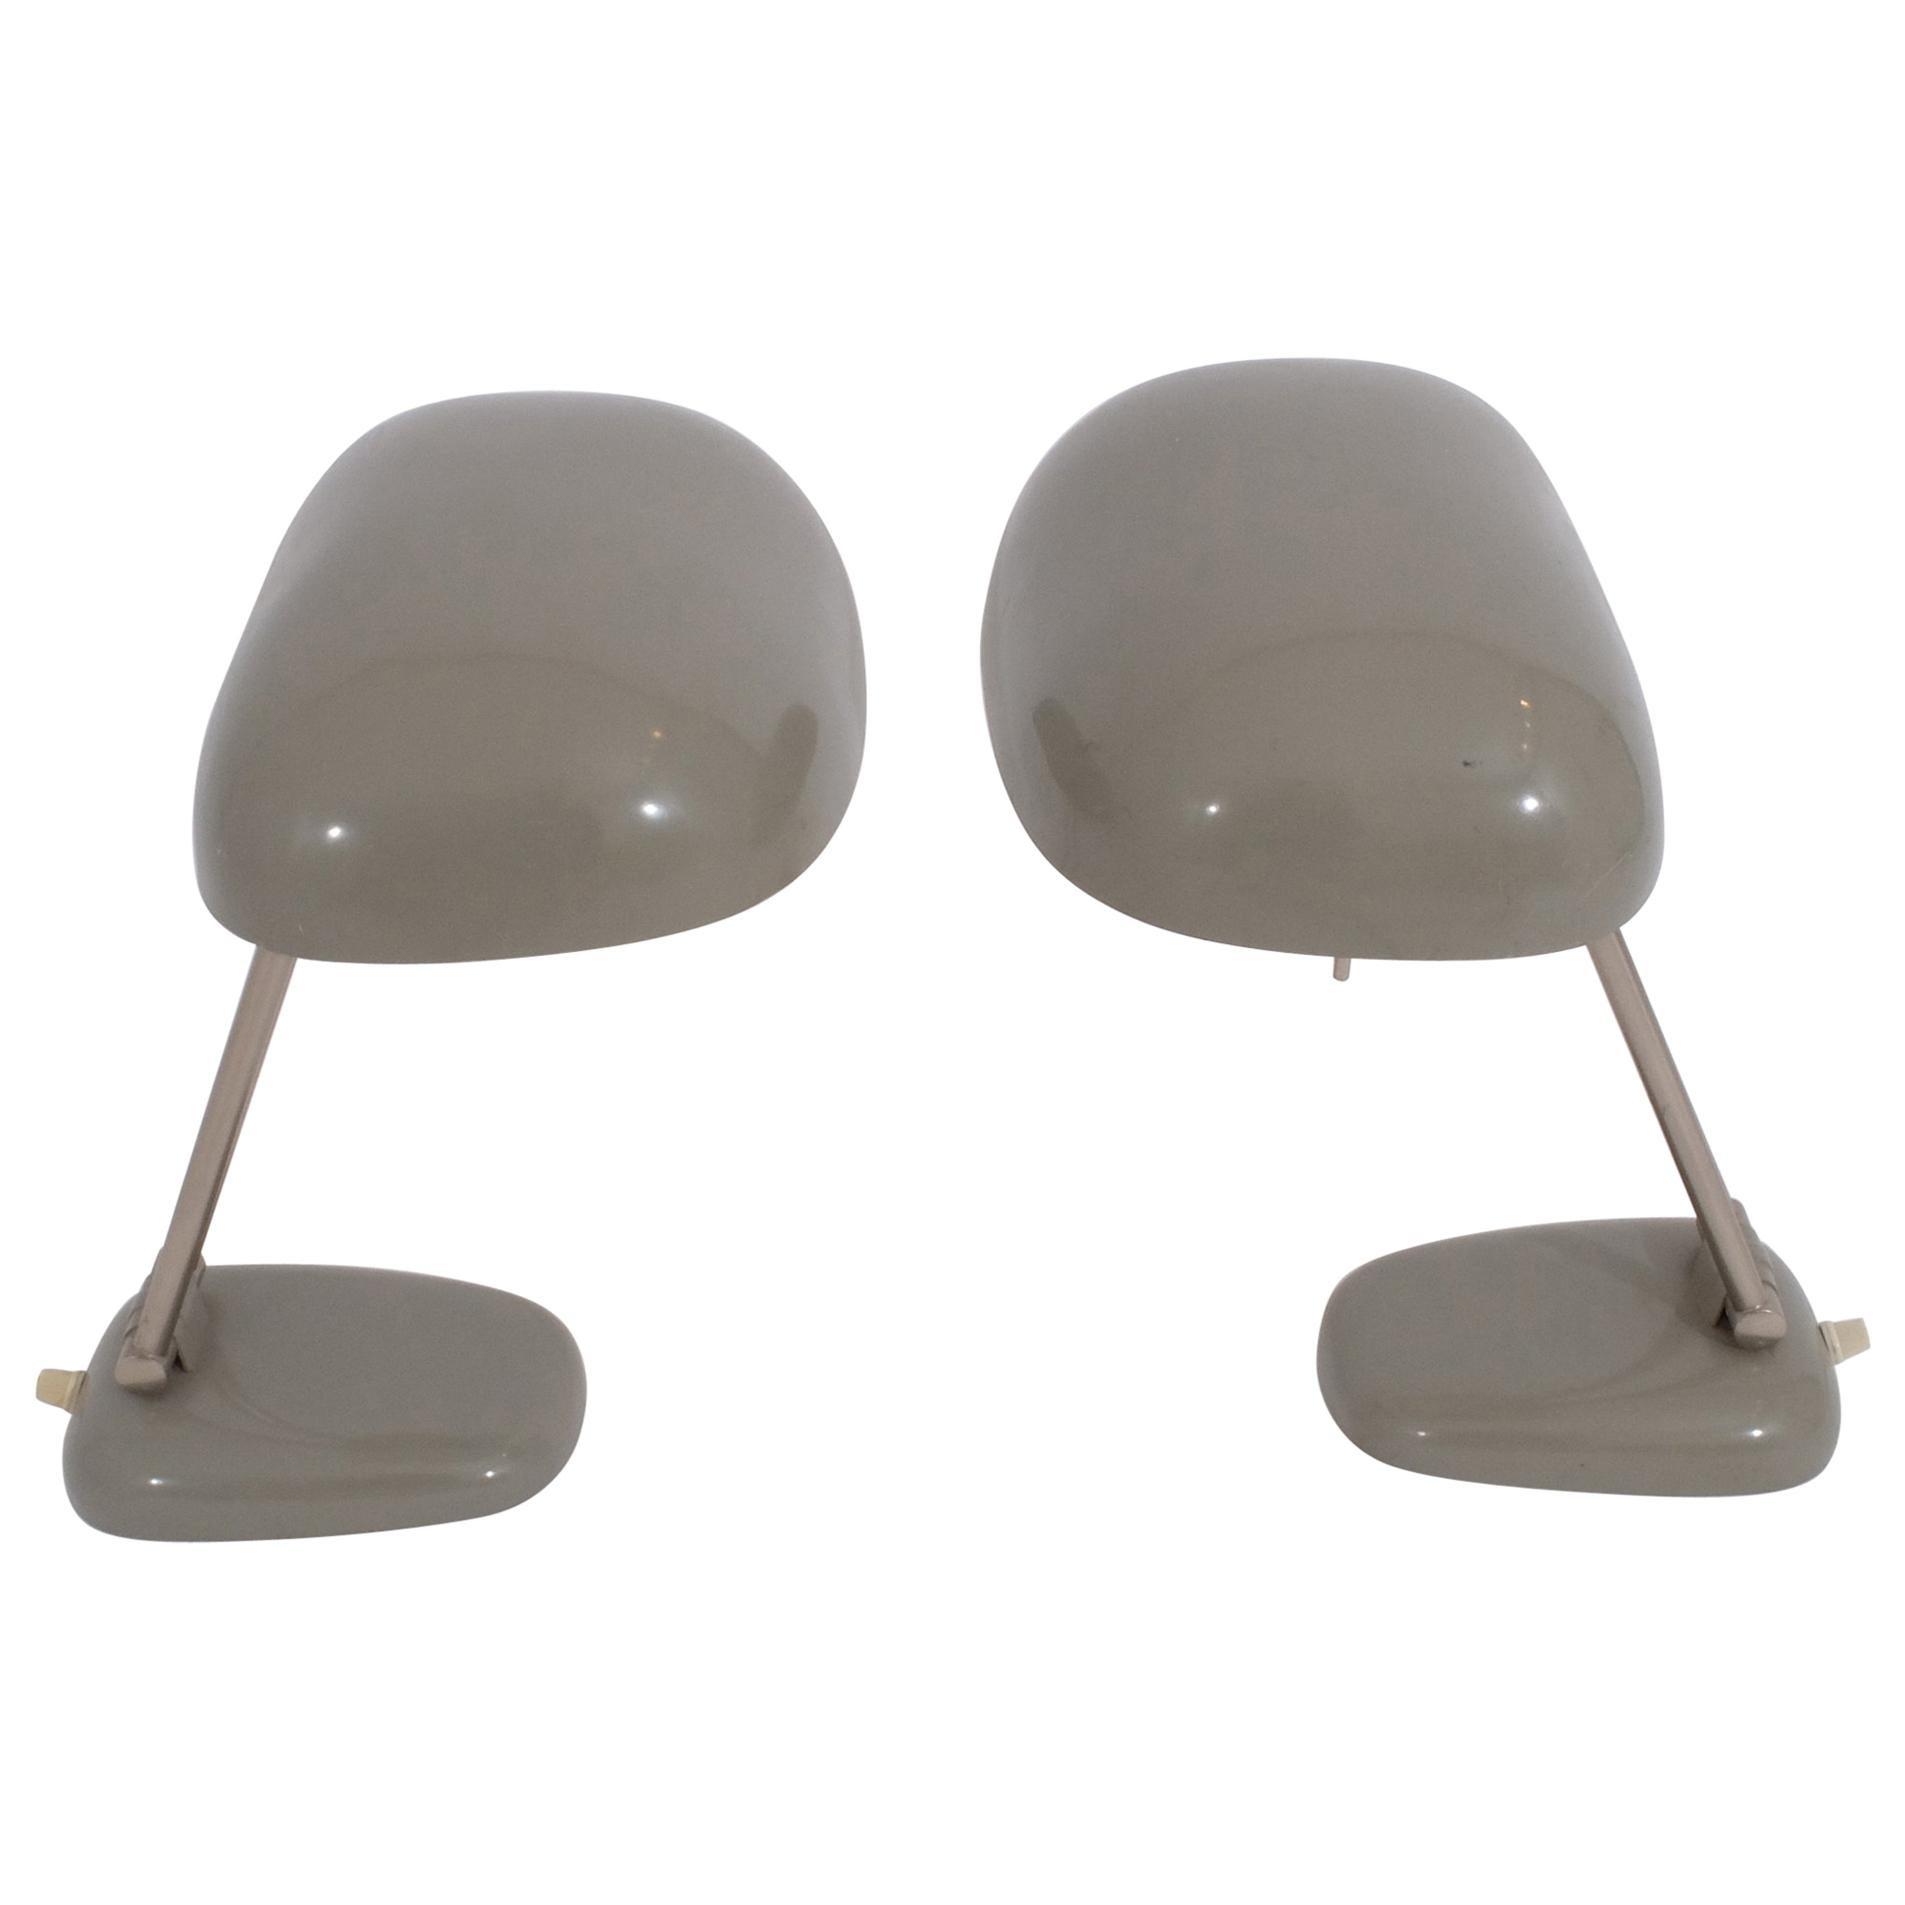 Pair of Sigfried Giedion Desk Lamp Model BT1 for BAG Turgi Swiss Made, 1940s